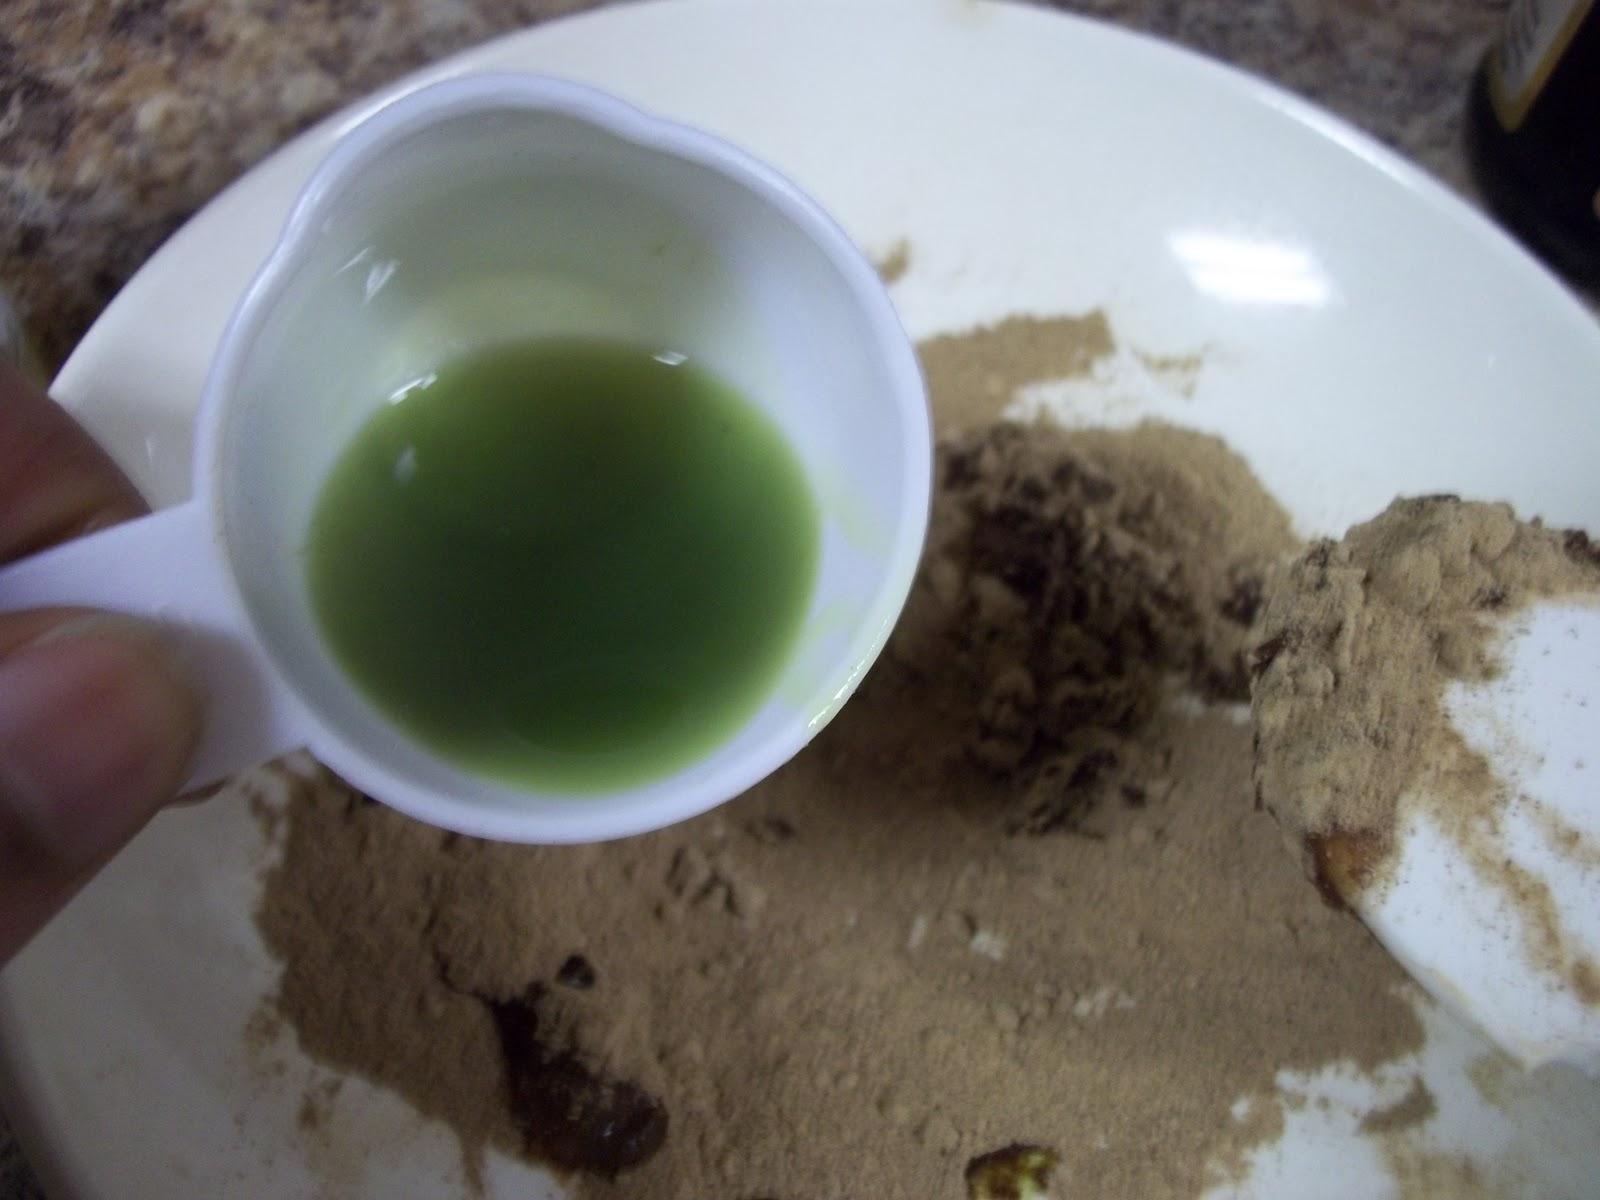 amla shikakai powder how to use